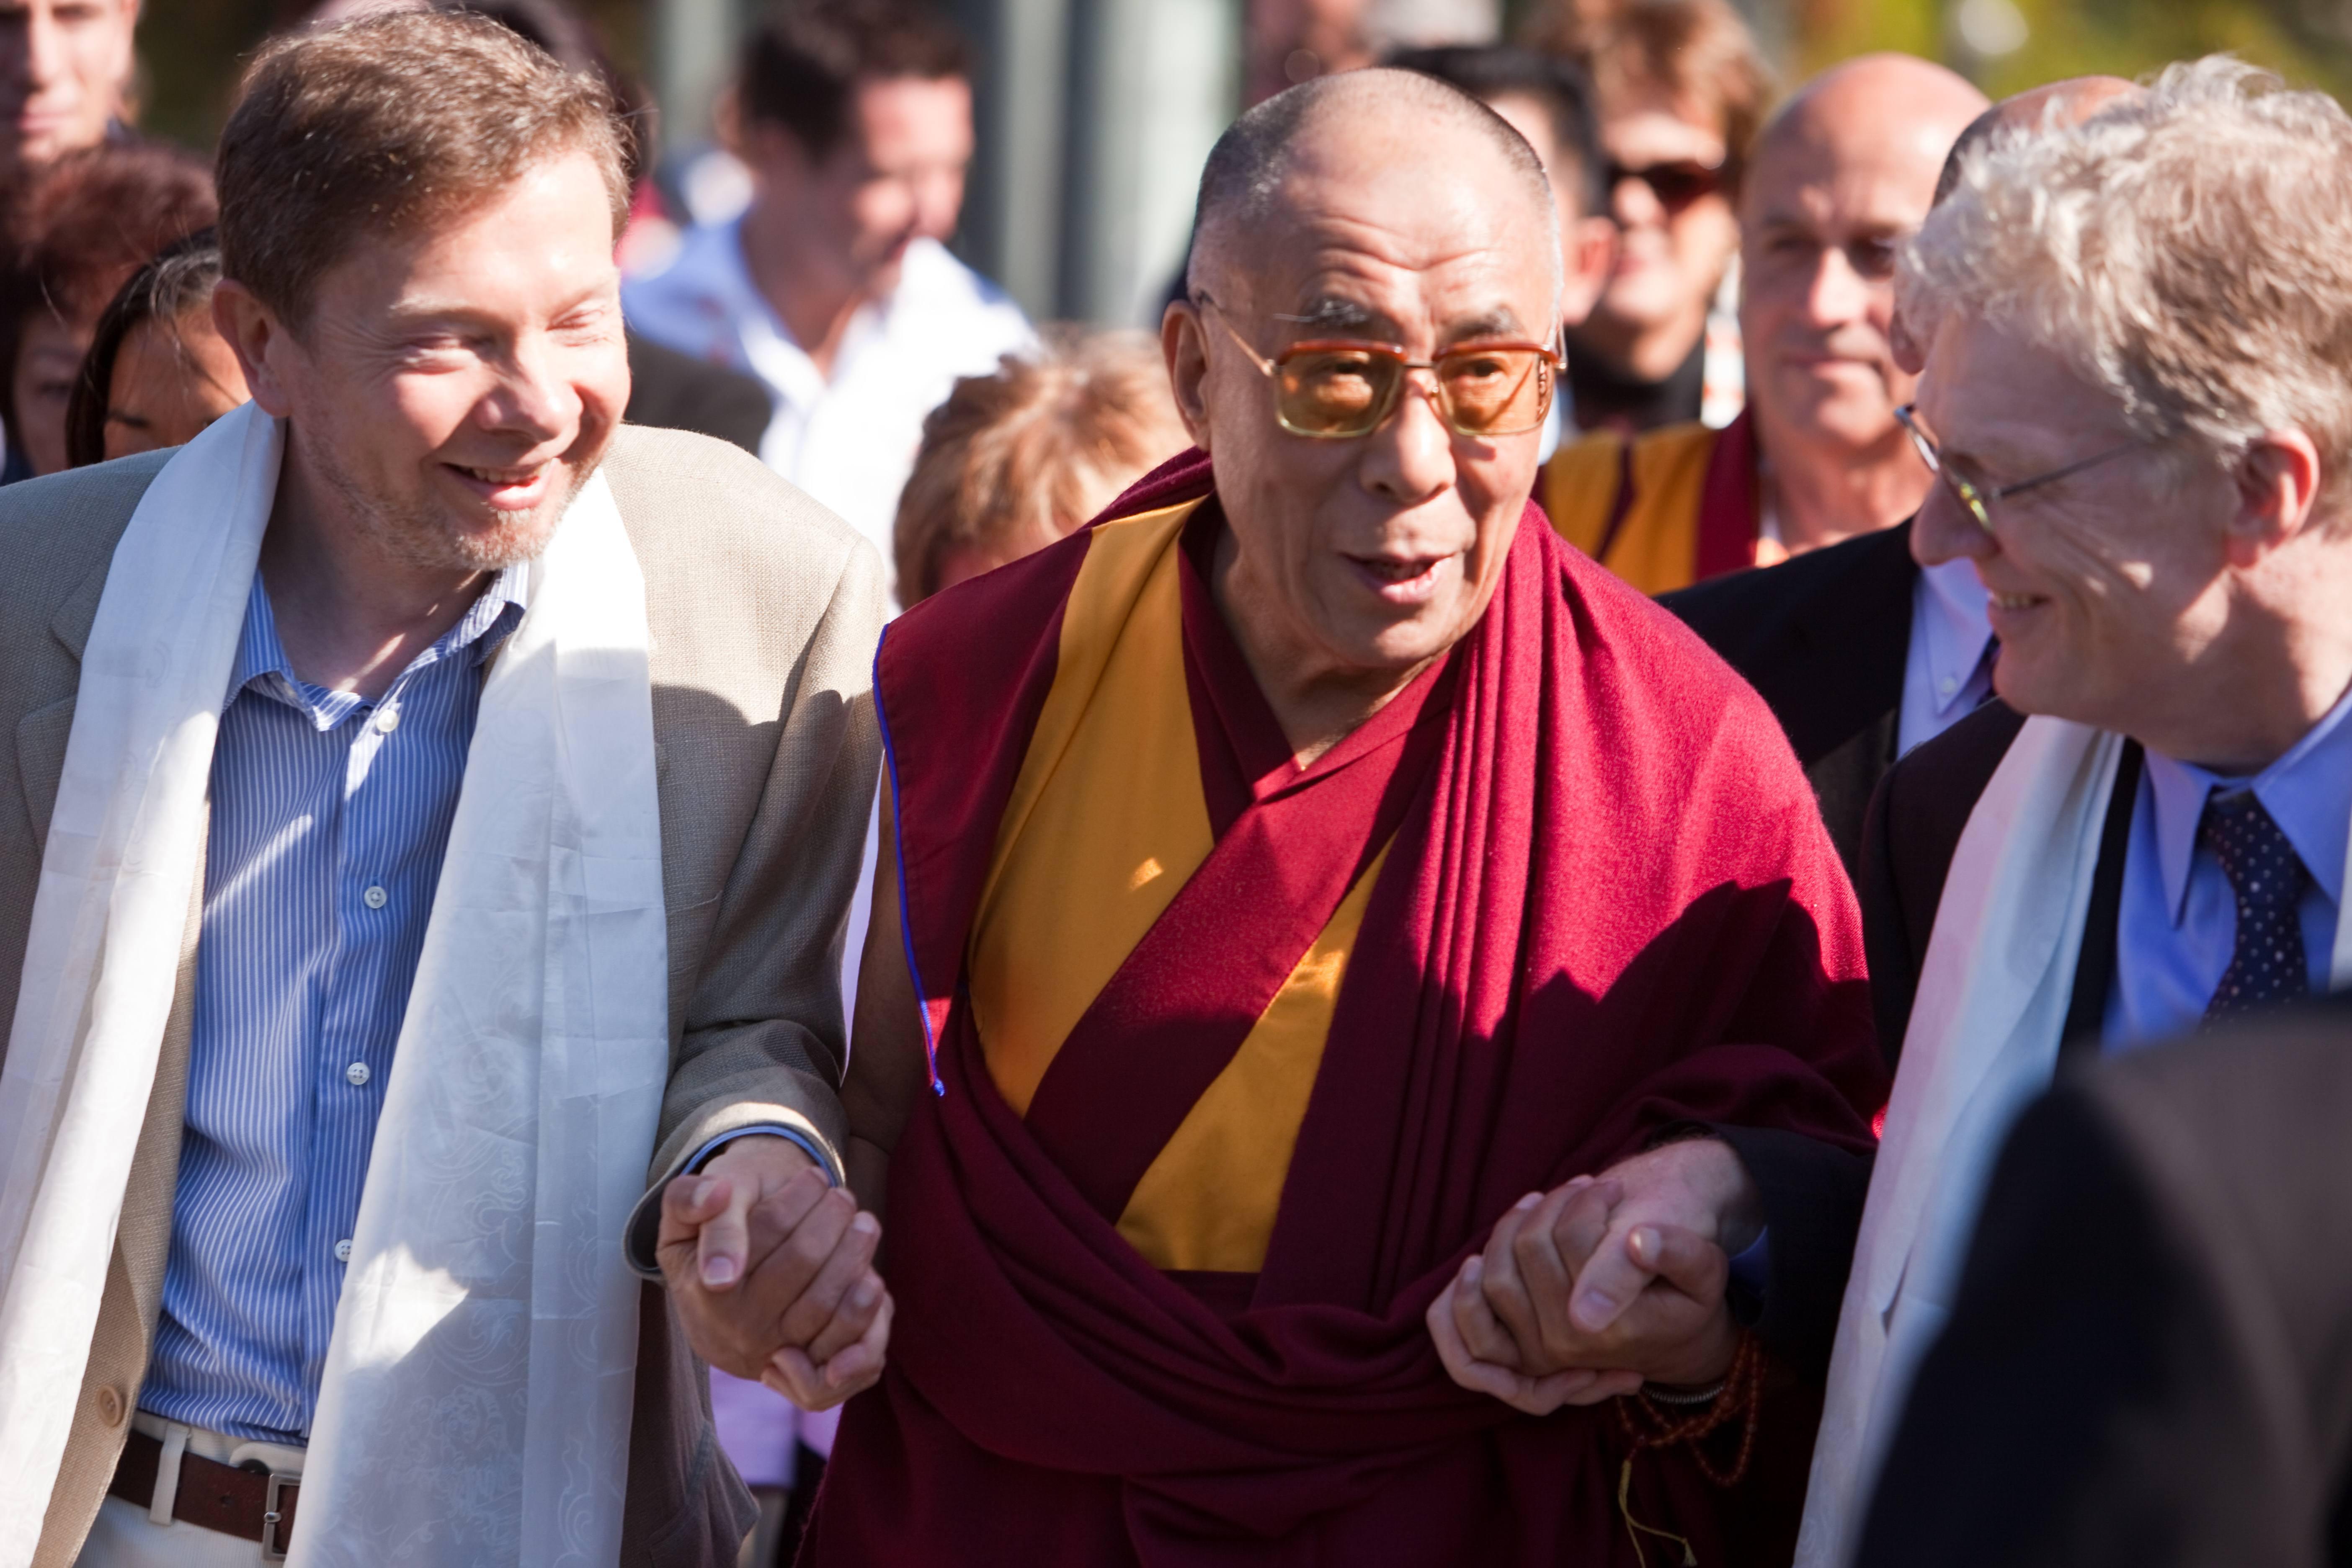 Eckhart Tolle and the Dalai Lama